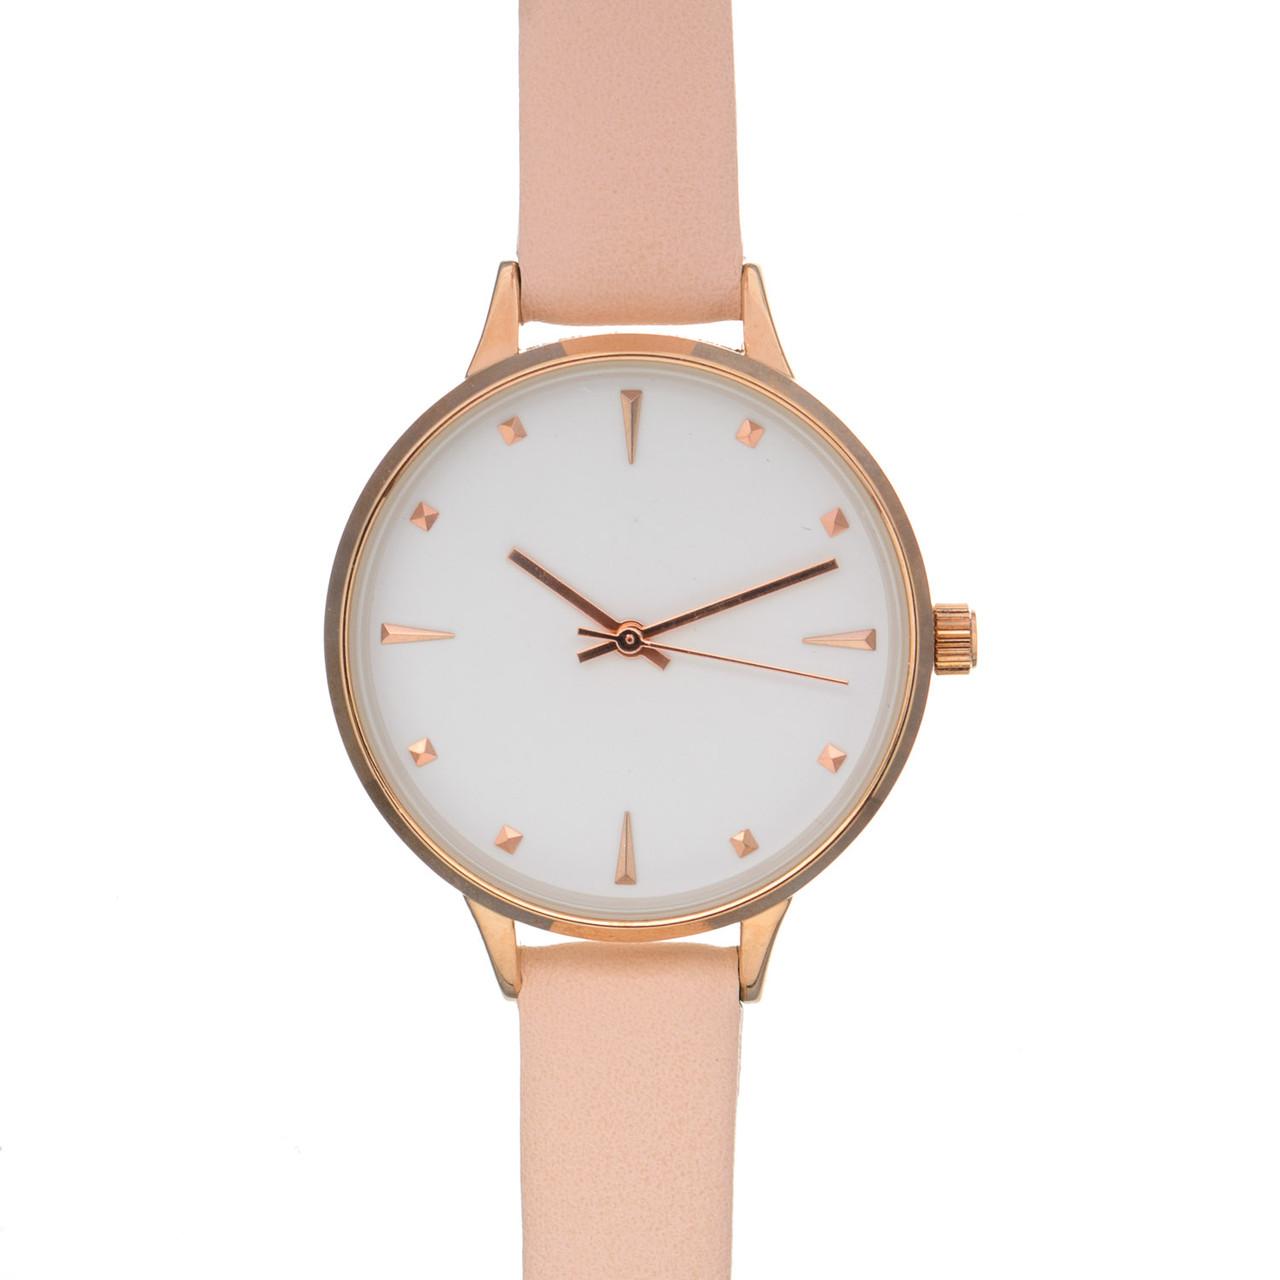 Жіночий годинник Even&Odd rf17-0765 Gold